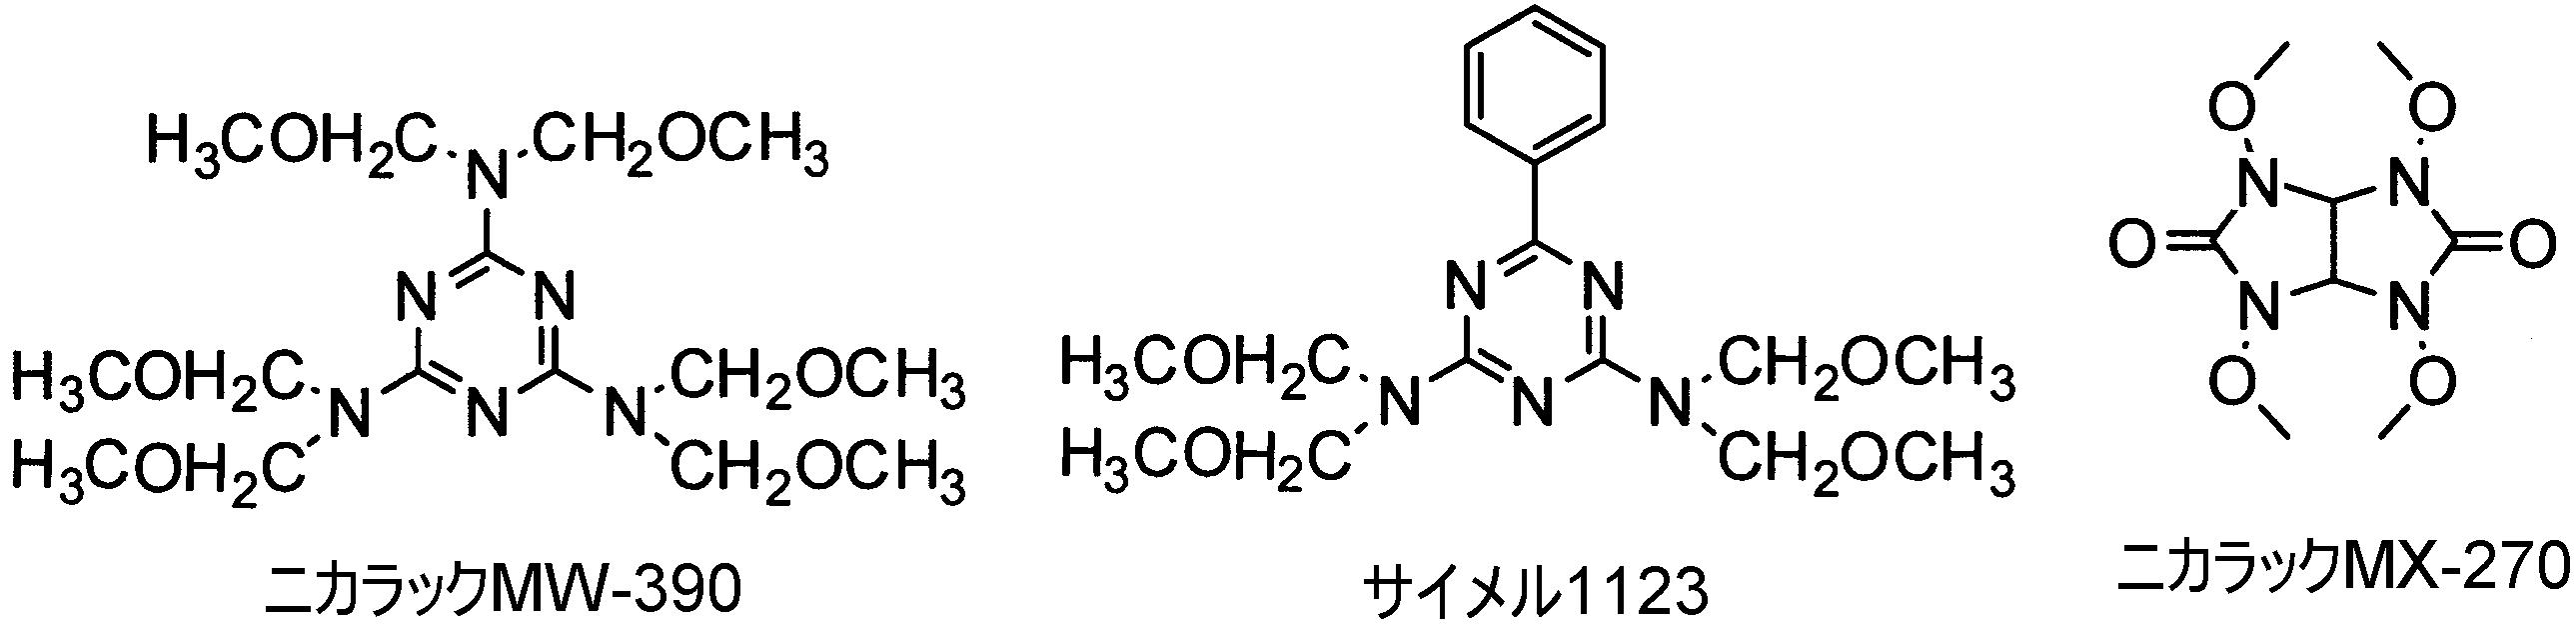 Patent WO2012074058A1 - 膜形成材料 ...